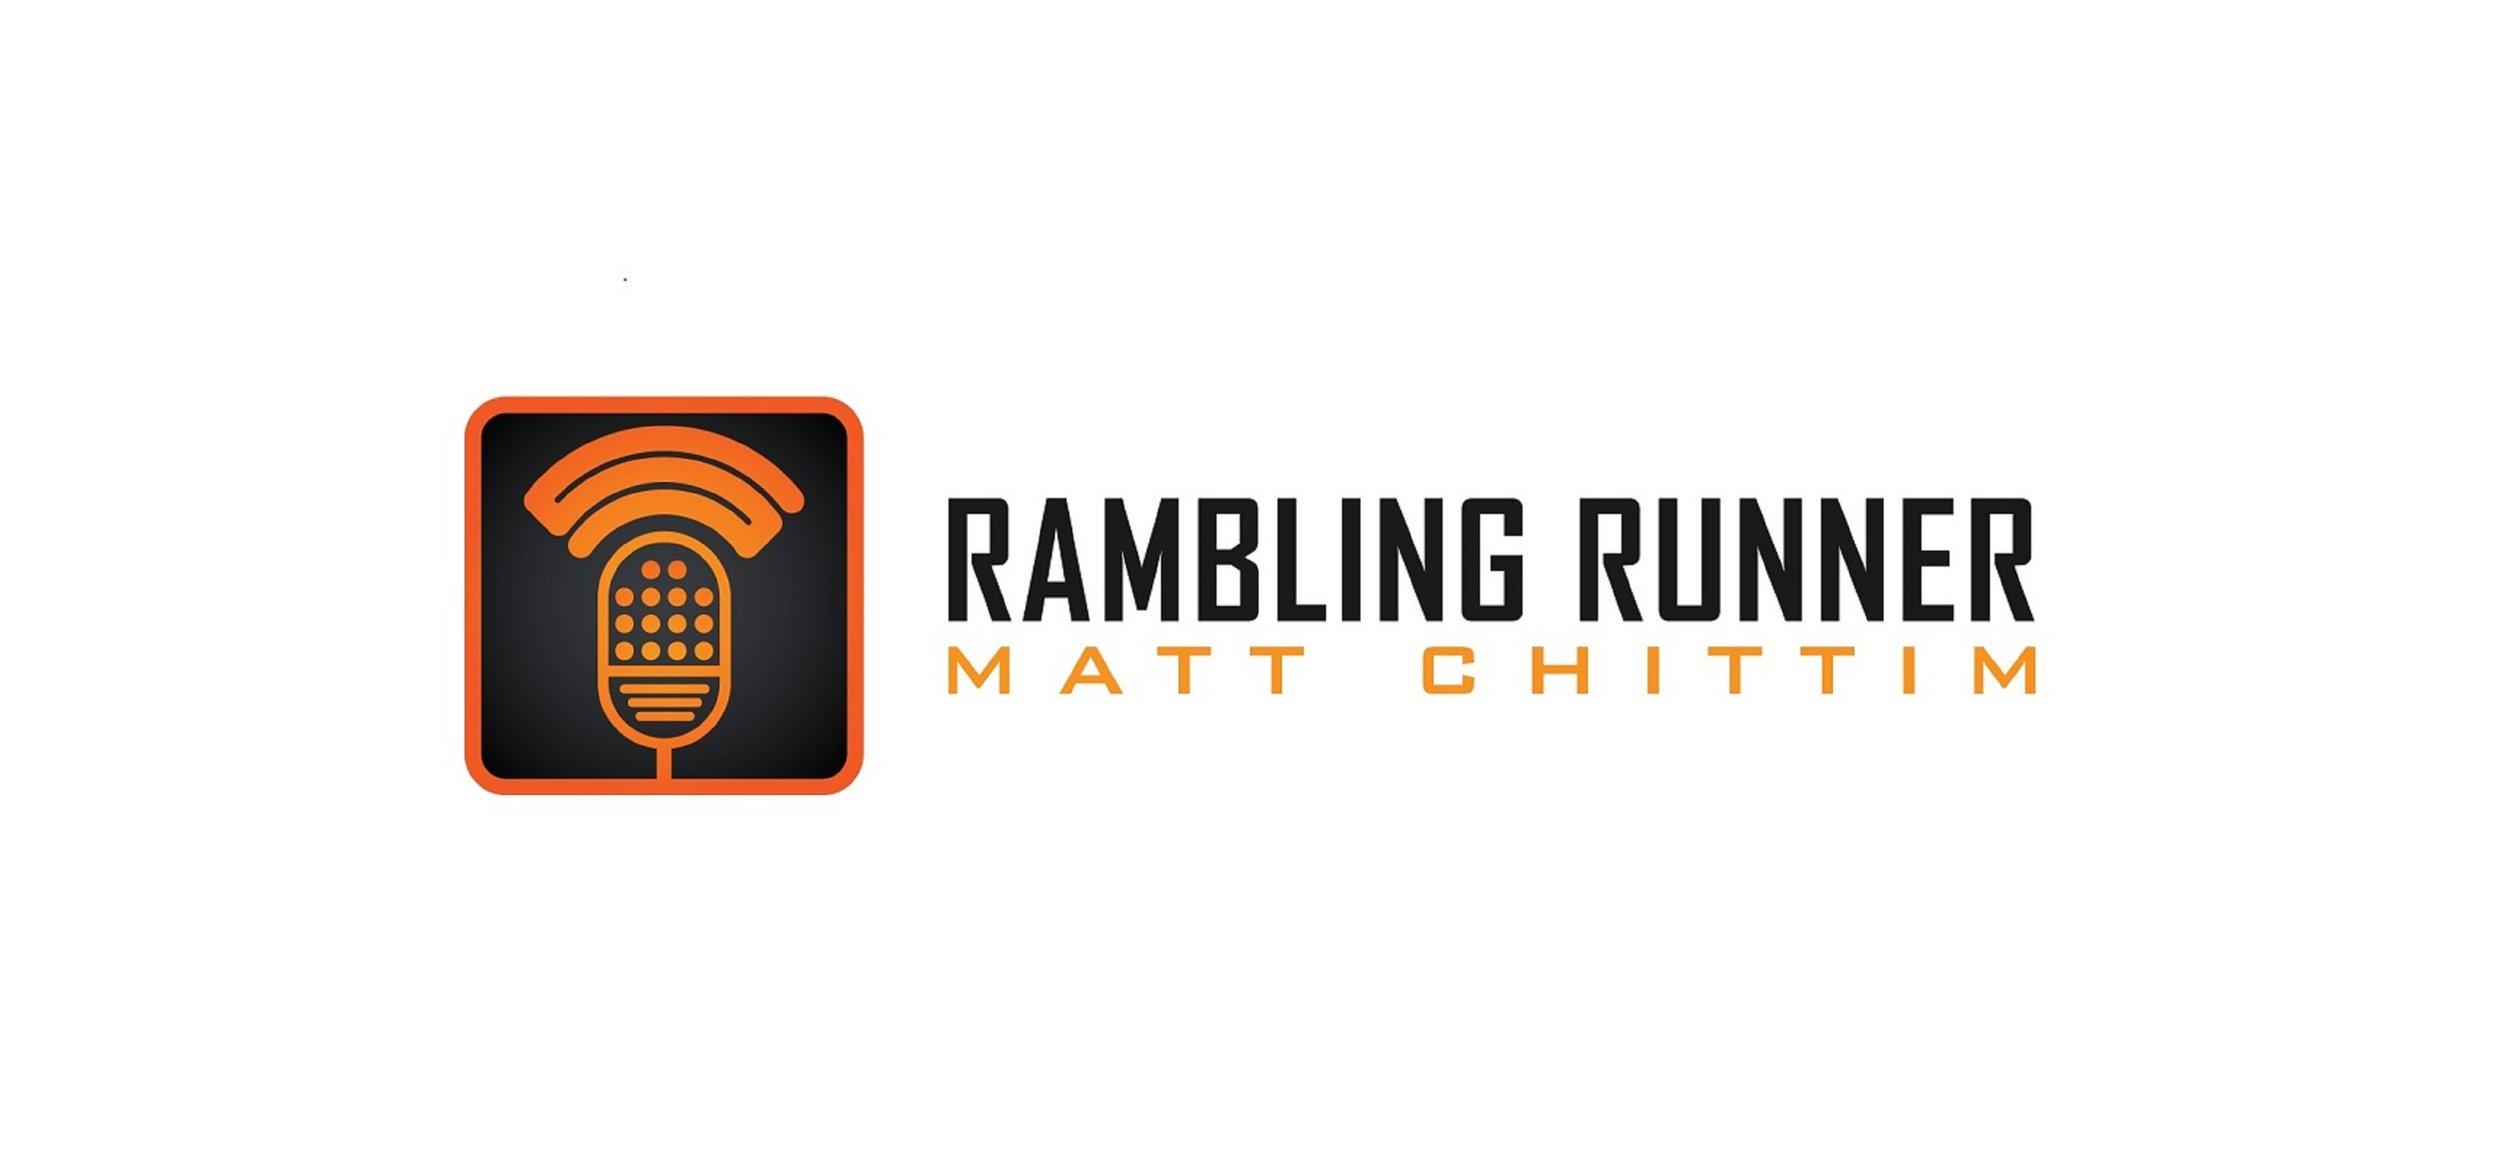 Ramlbing Runner Horizontal Logo HUGE.jpg